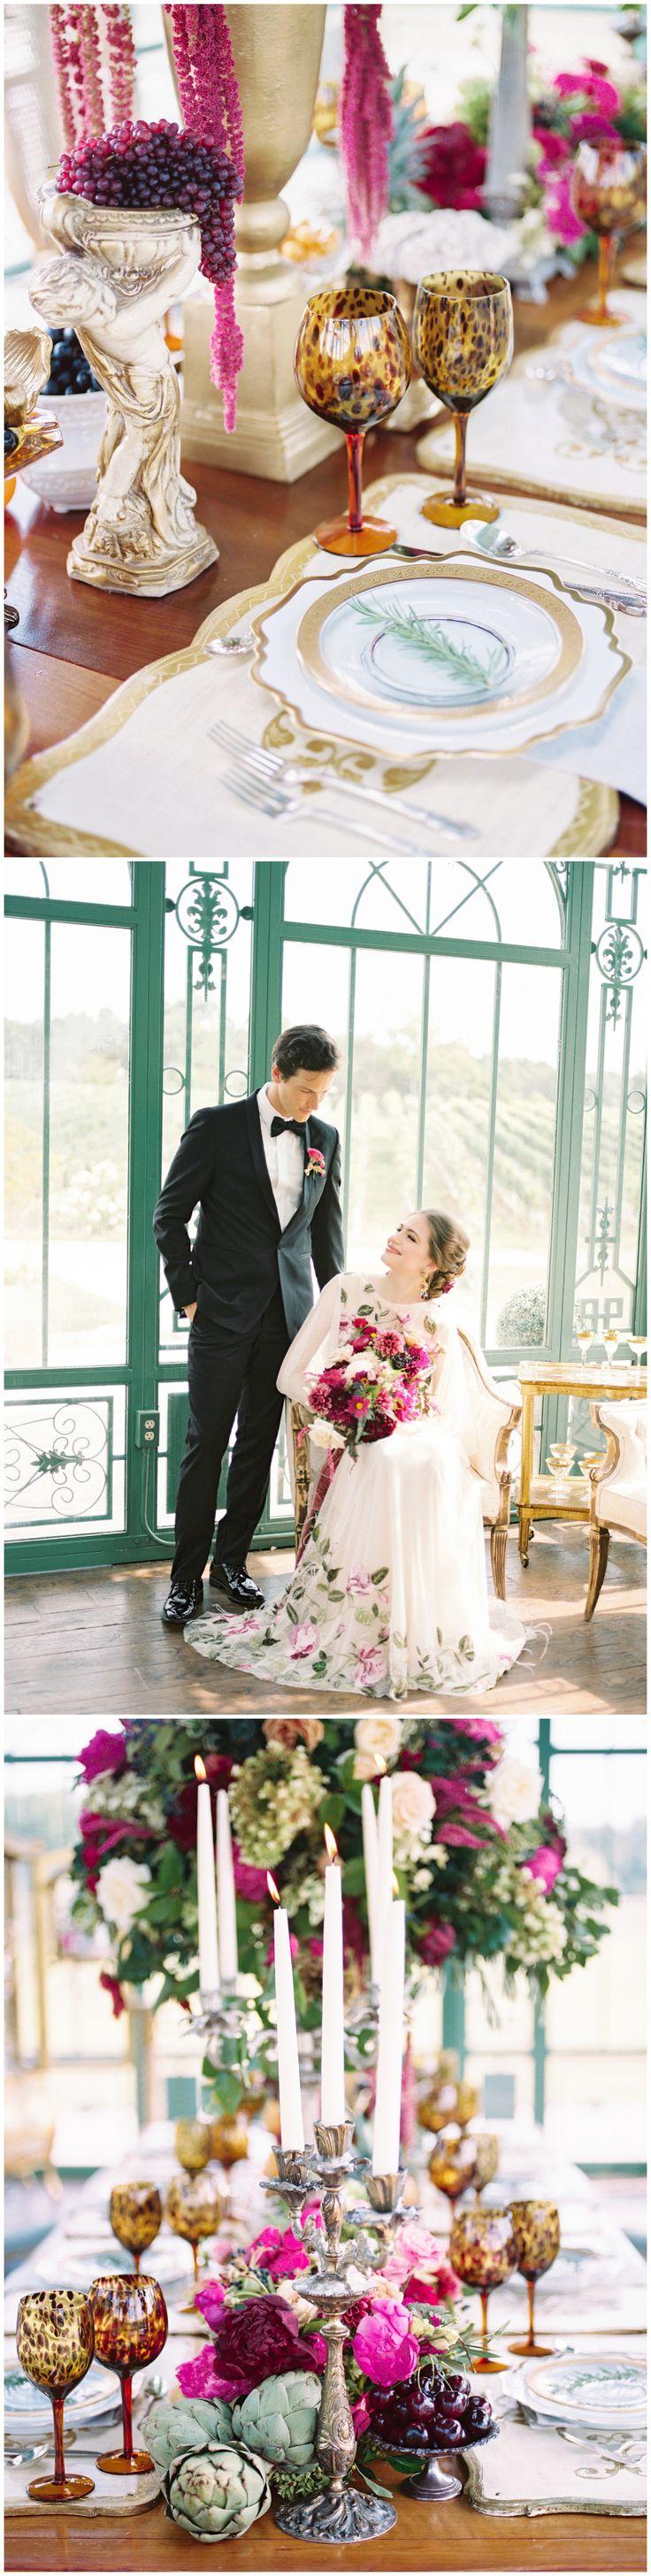 Italian Luxe Wedding Reception Details